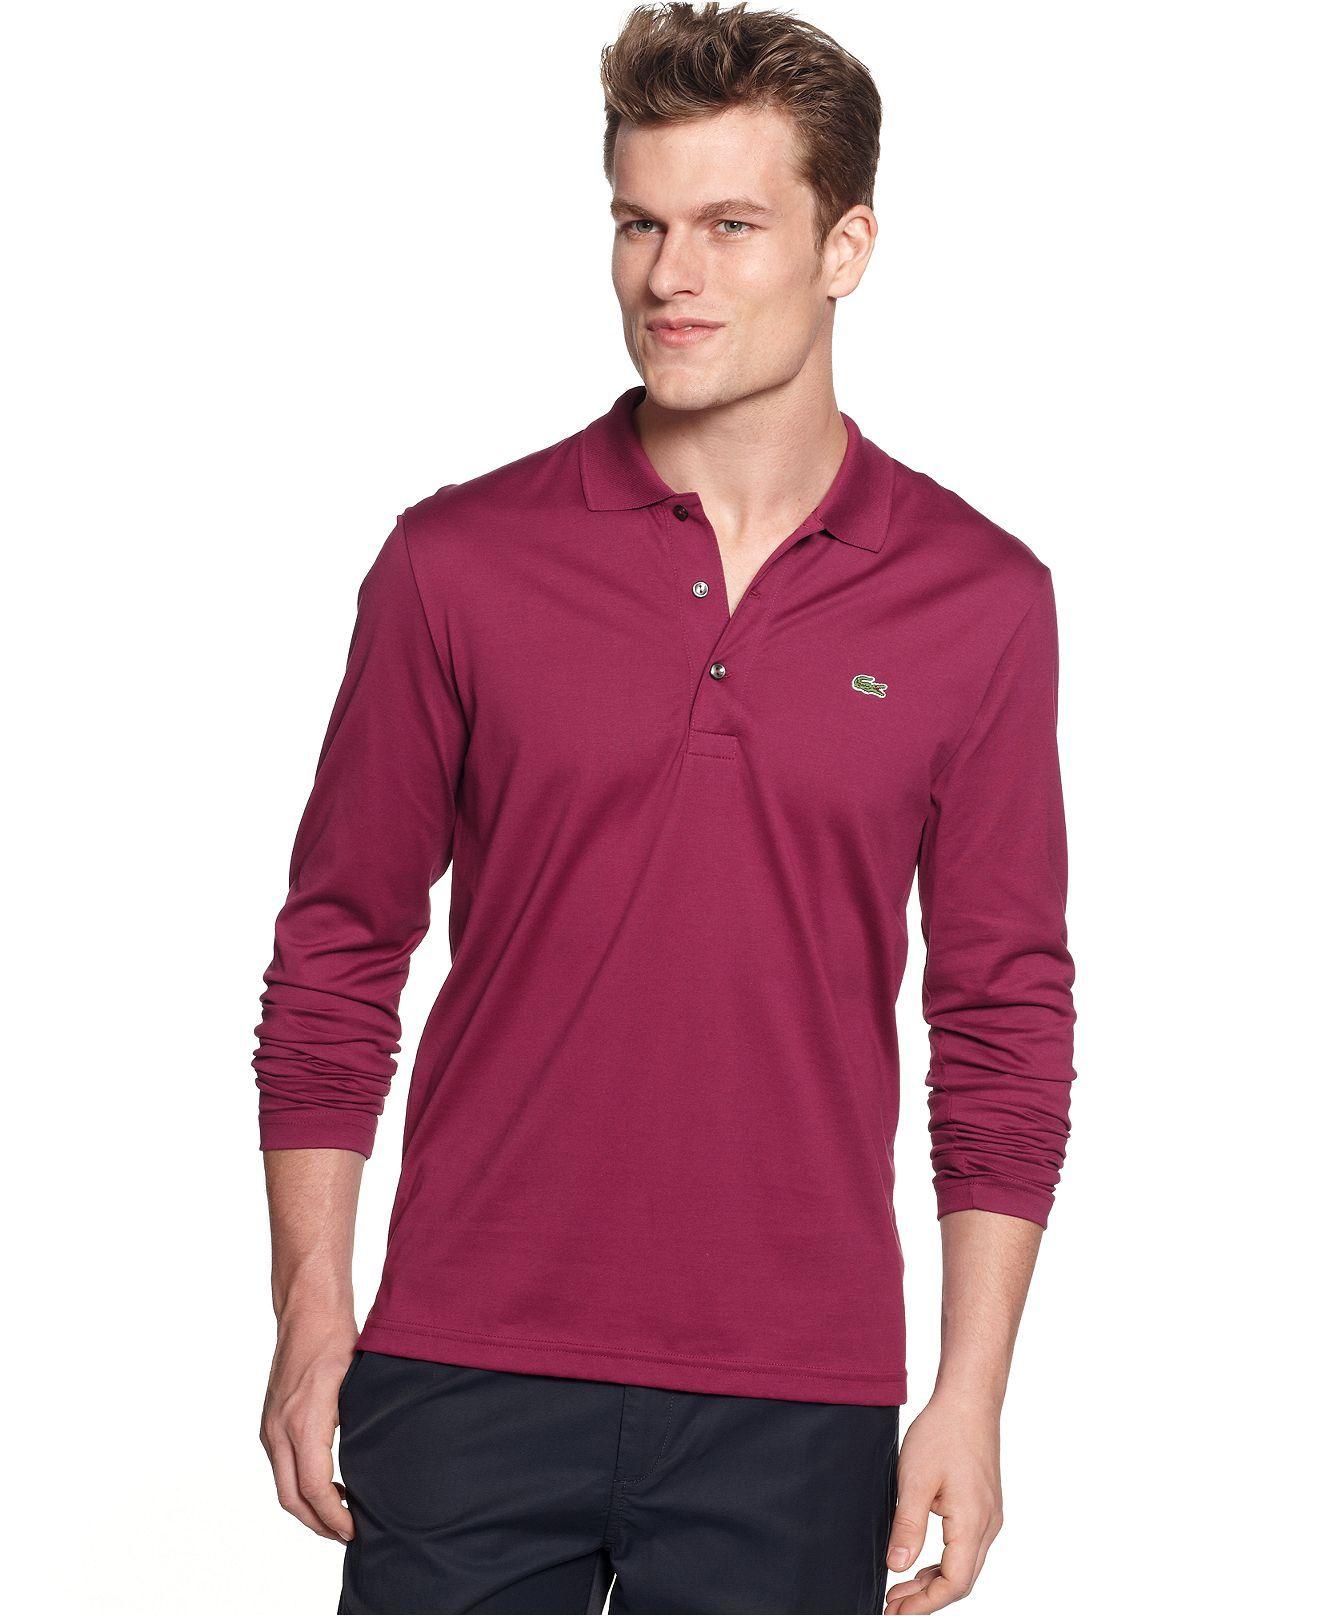 Lacoste Shirt, Long Sleeve Lightweight Polo Shirt - Mens Polos ...